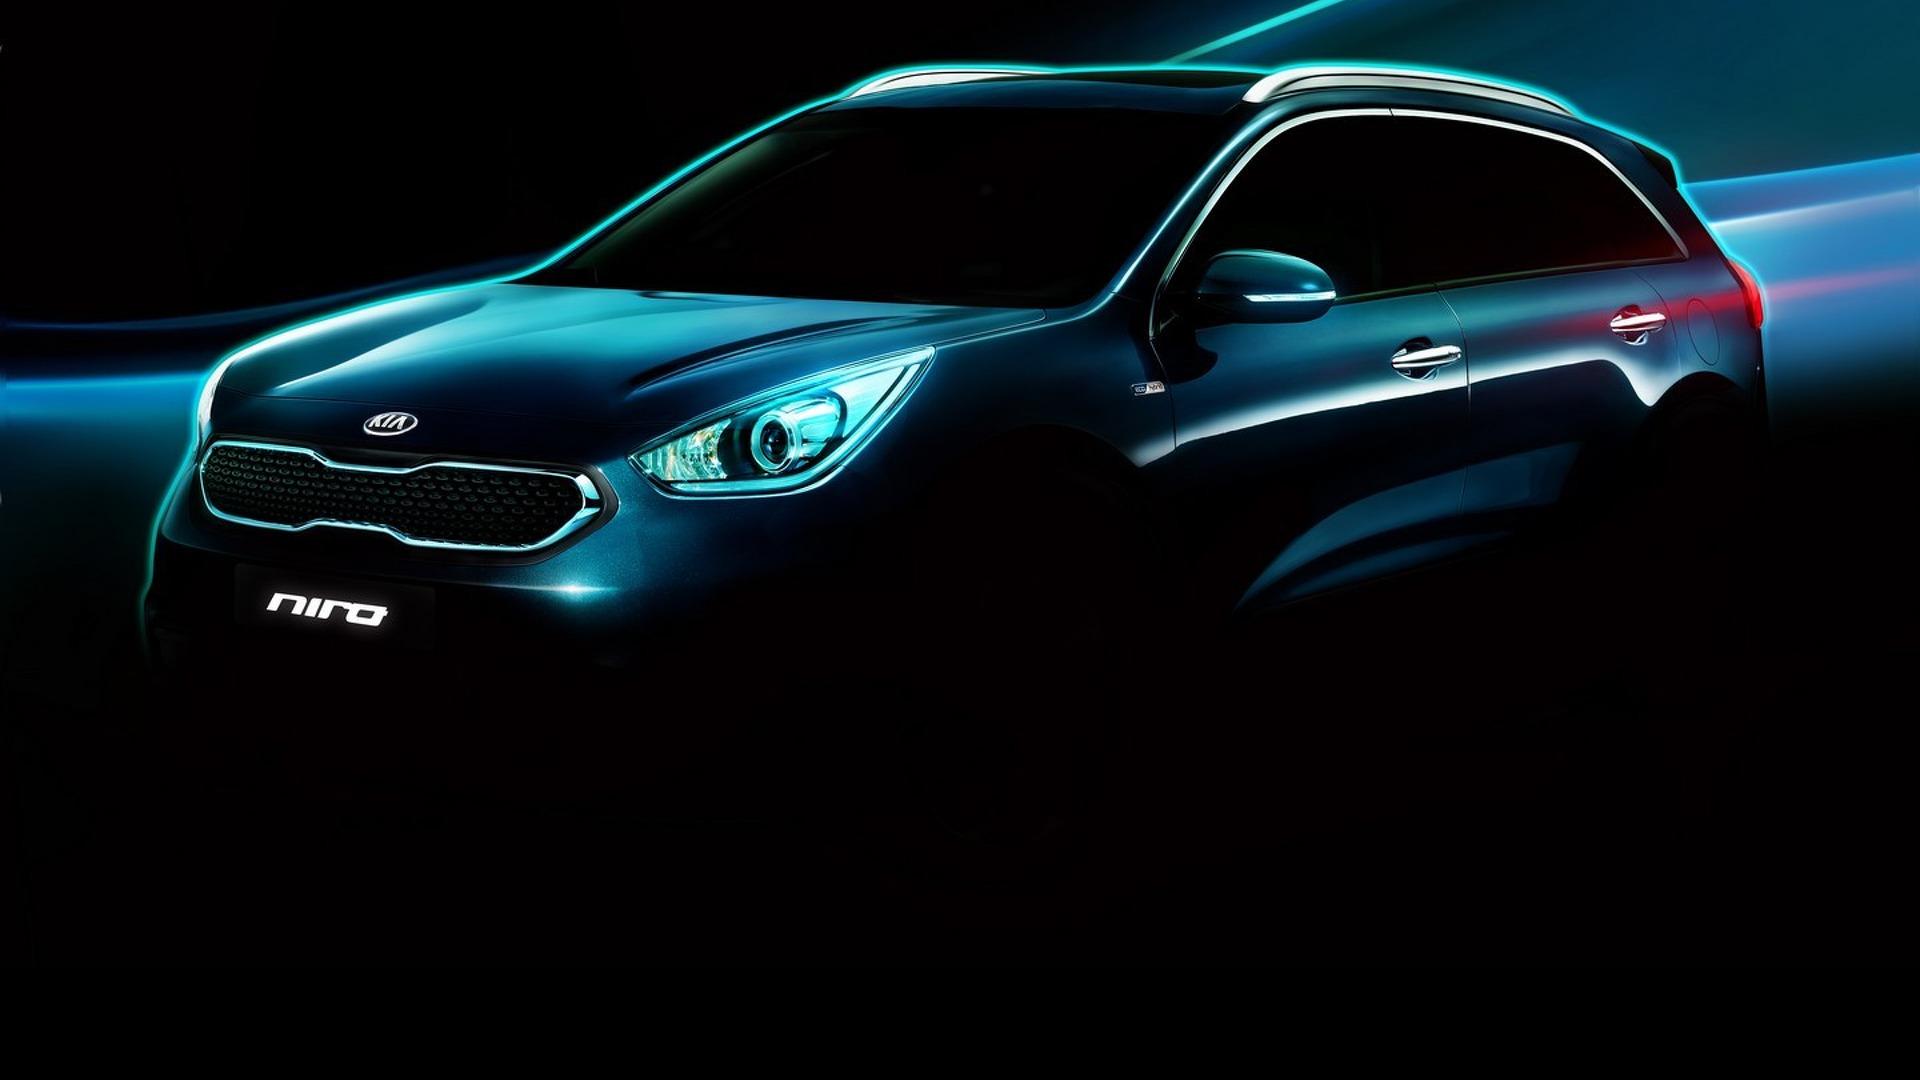 Kia teases Niro Hybrid Utility Vehicle ahead of Chicago debut